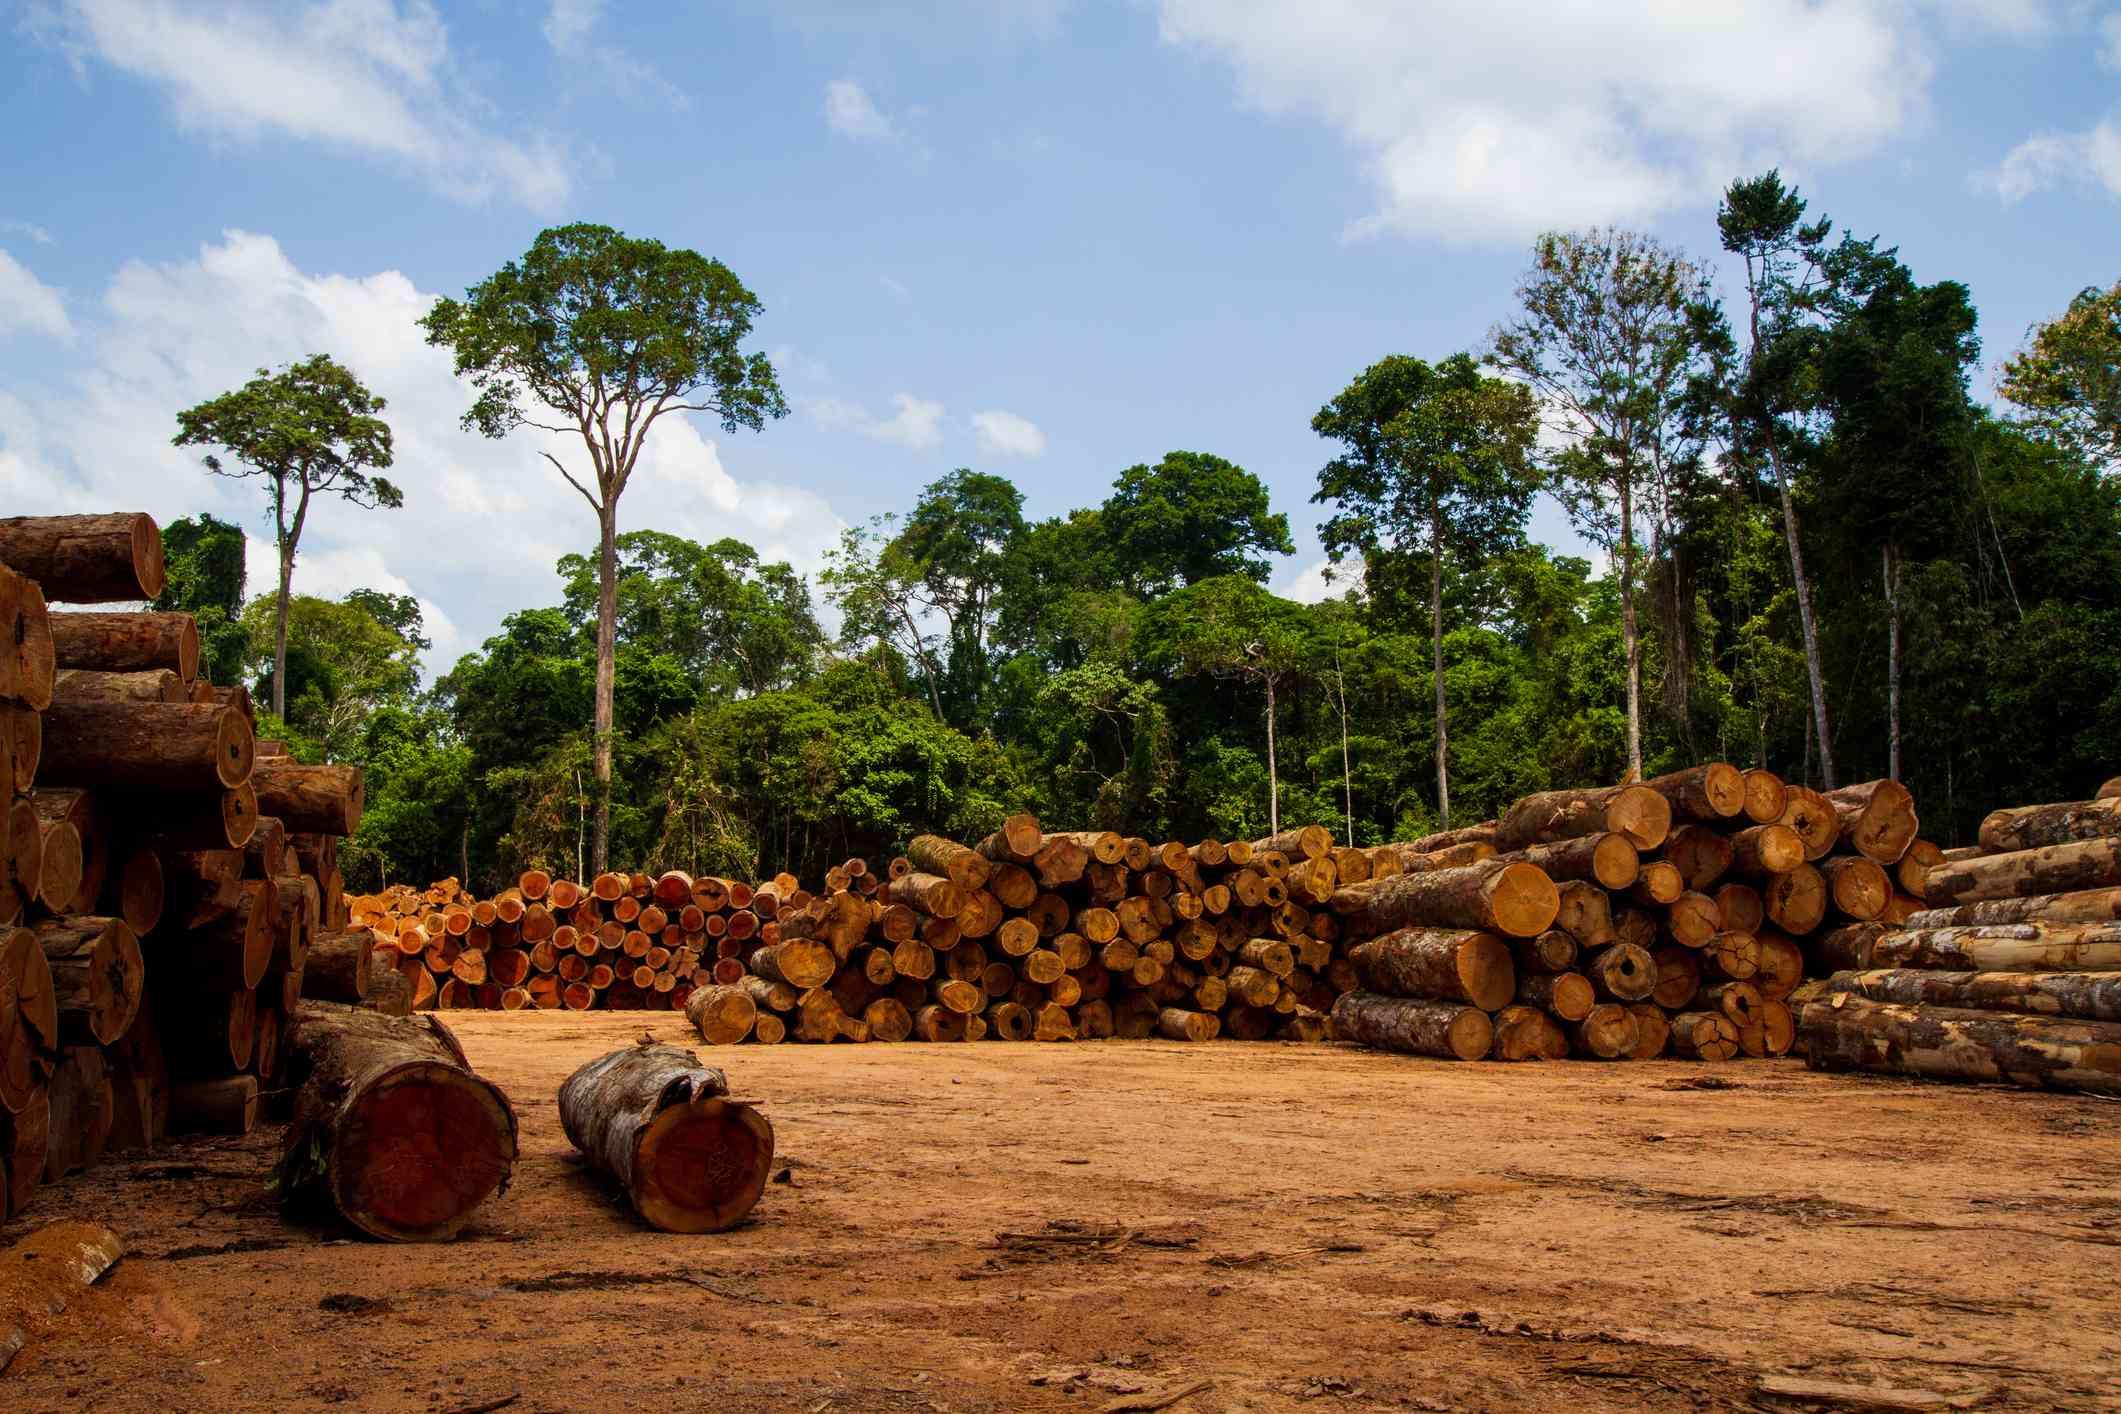 Logging operation in Brazil